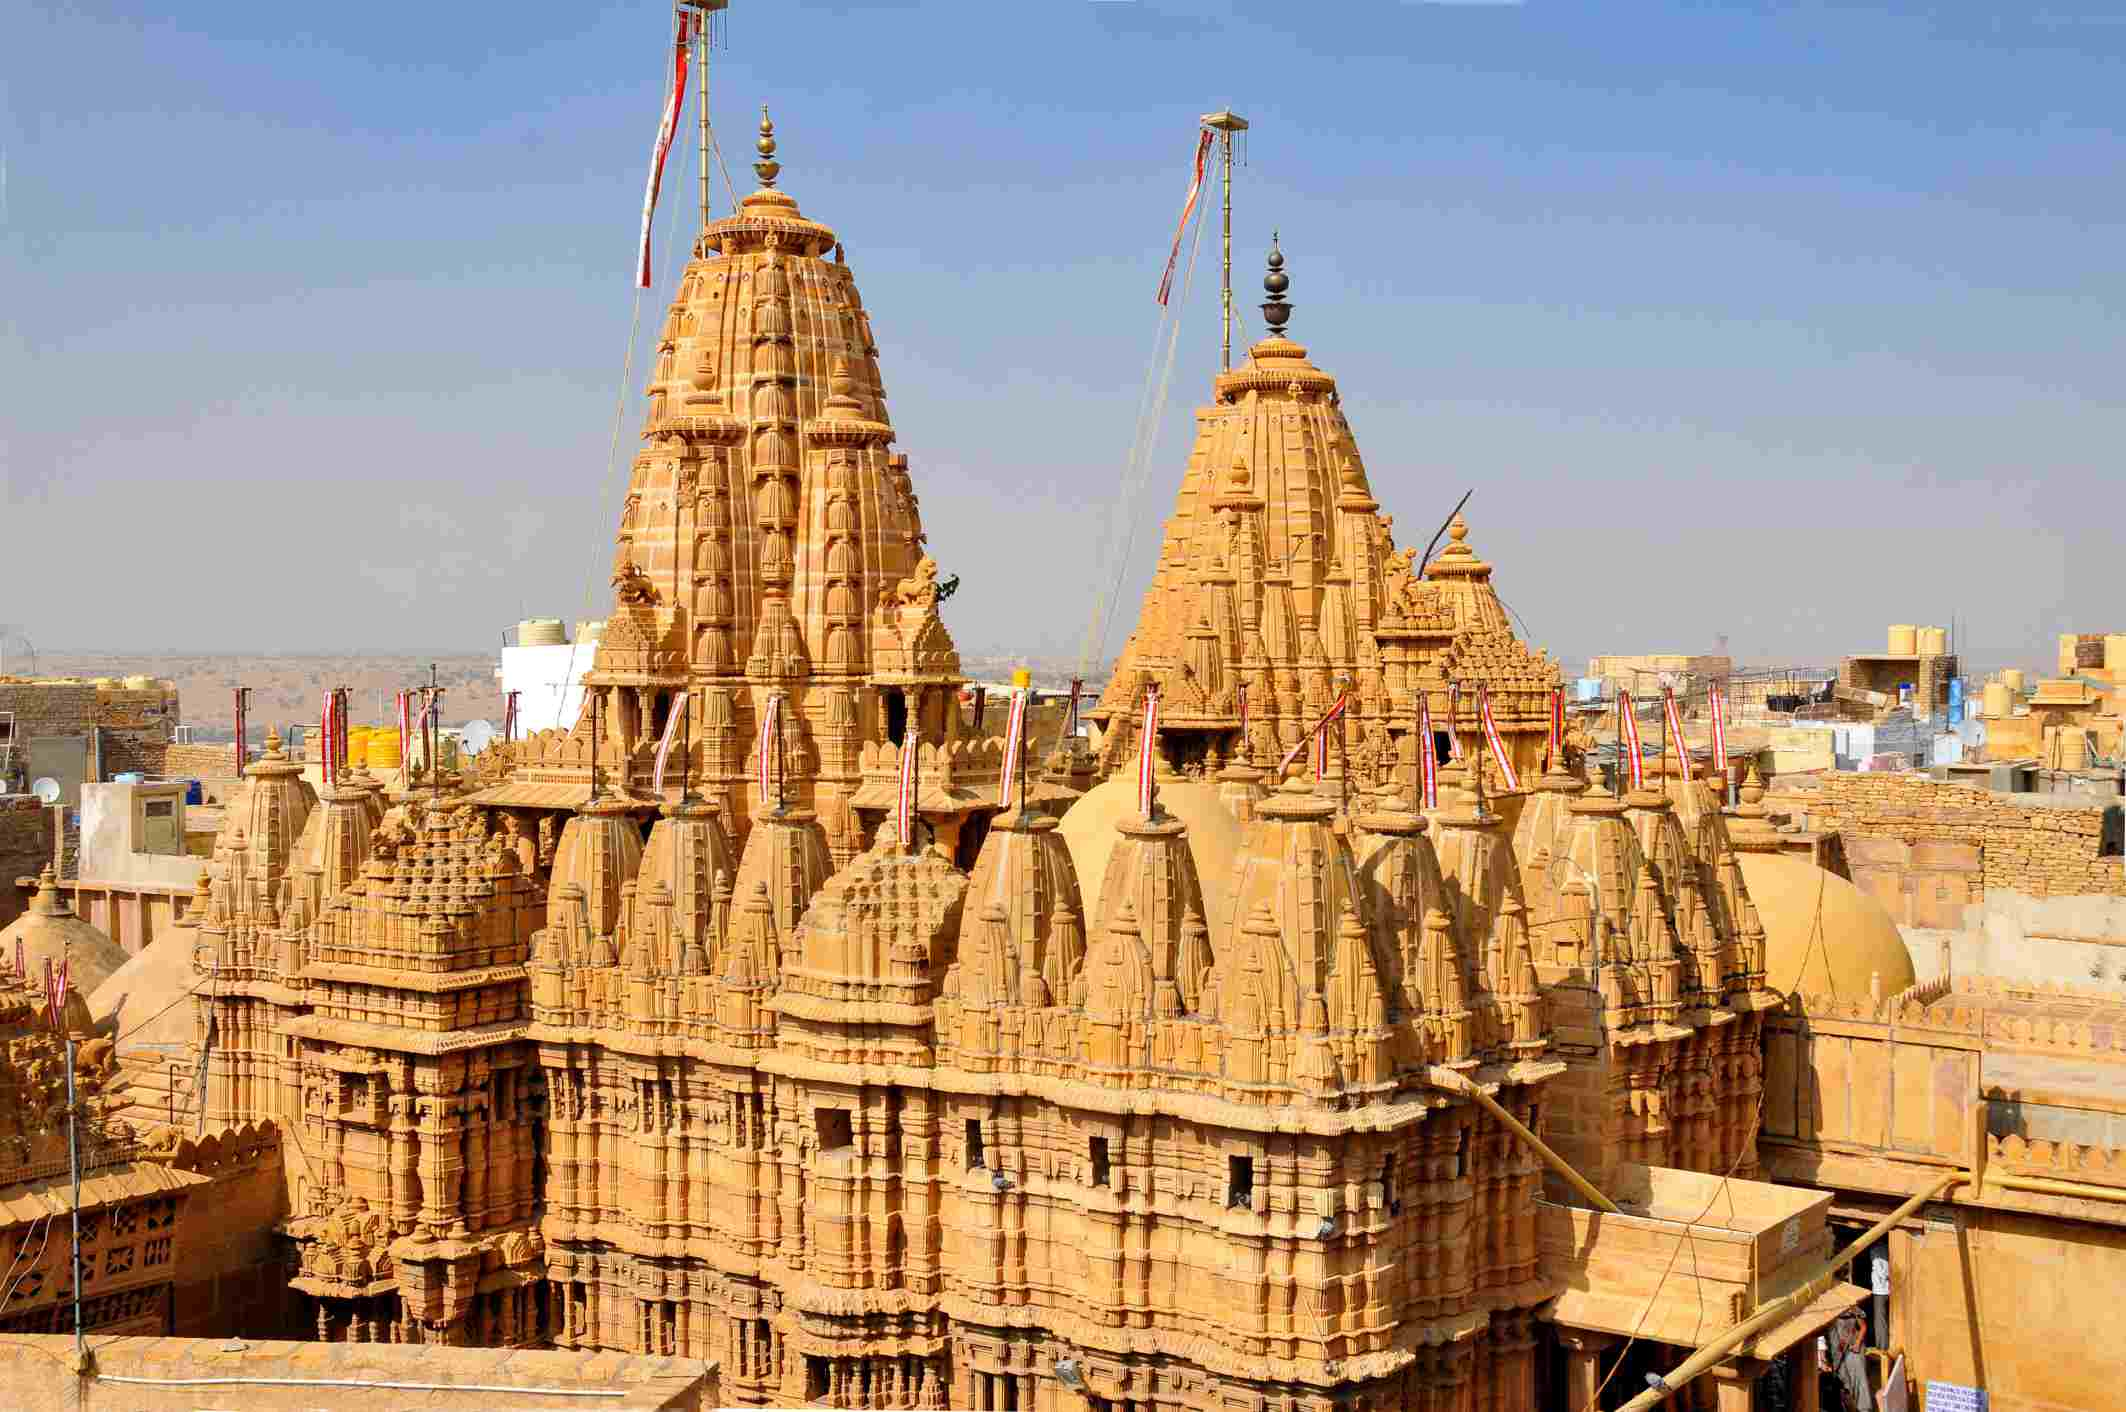 Jain temples at Jaisalmer